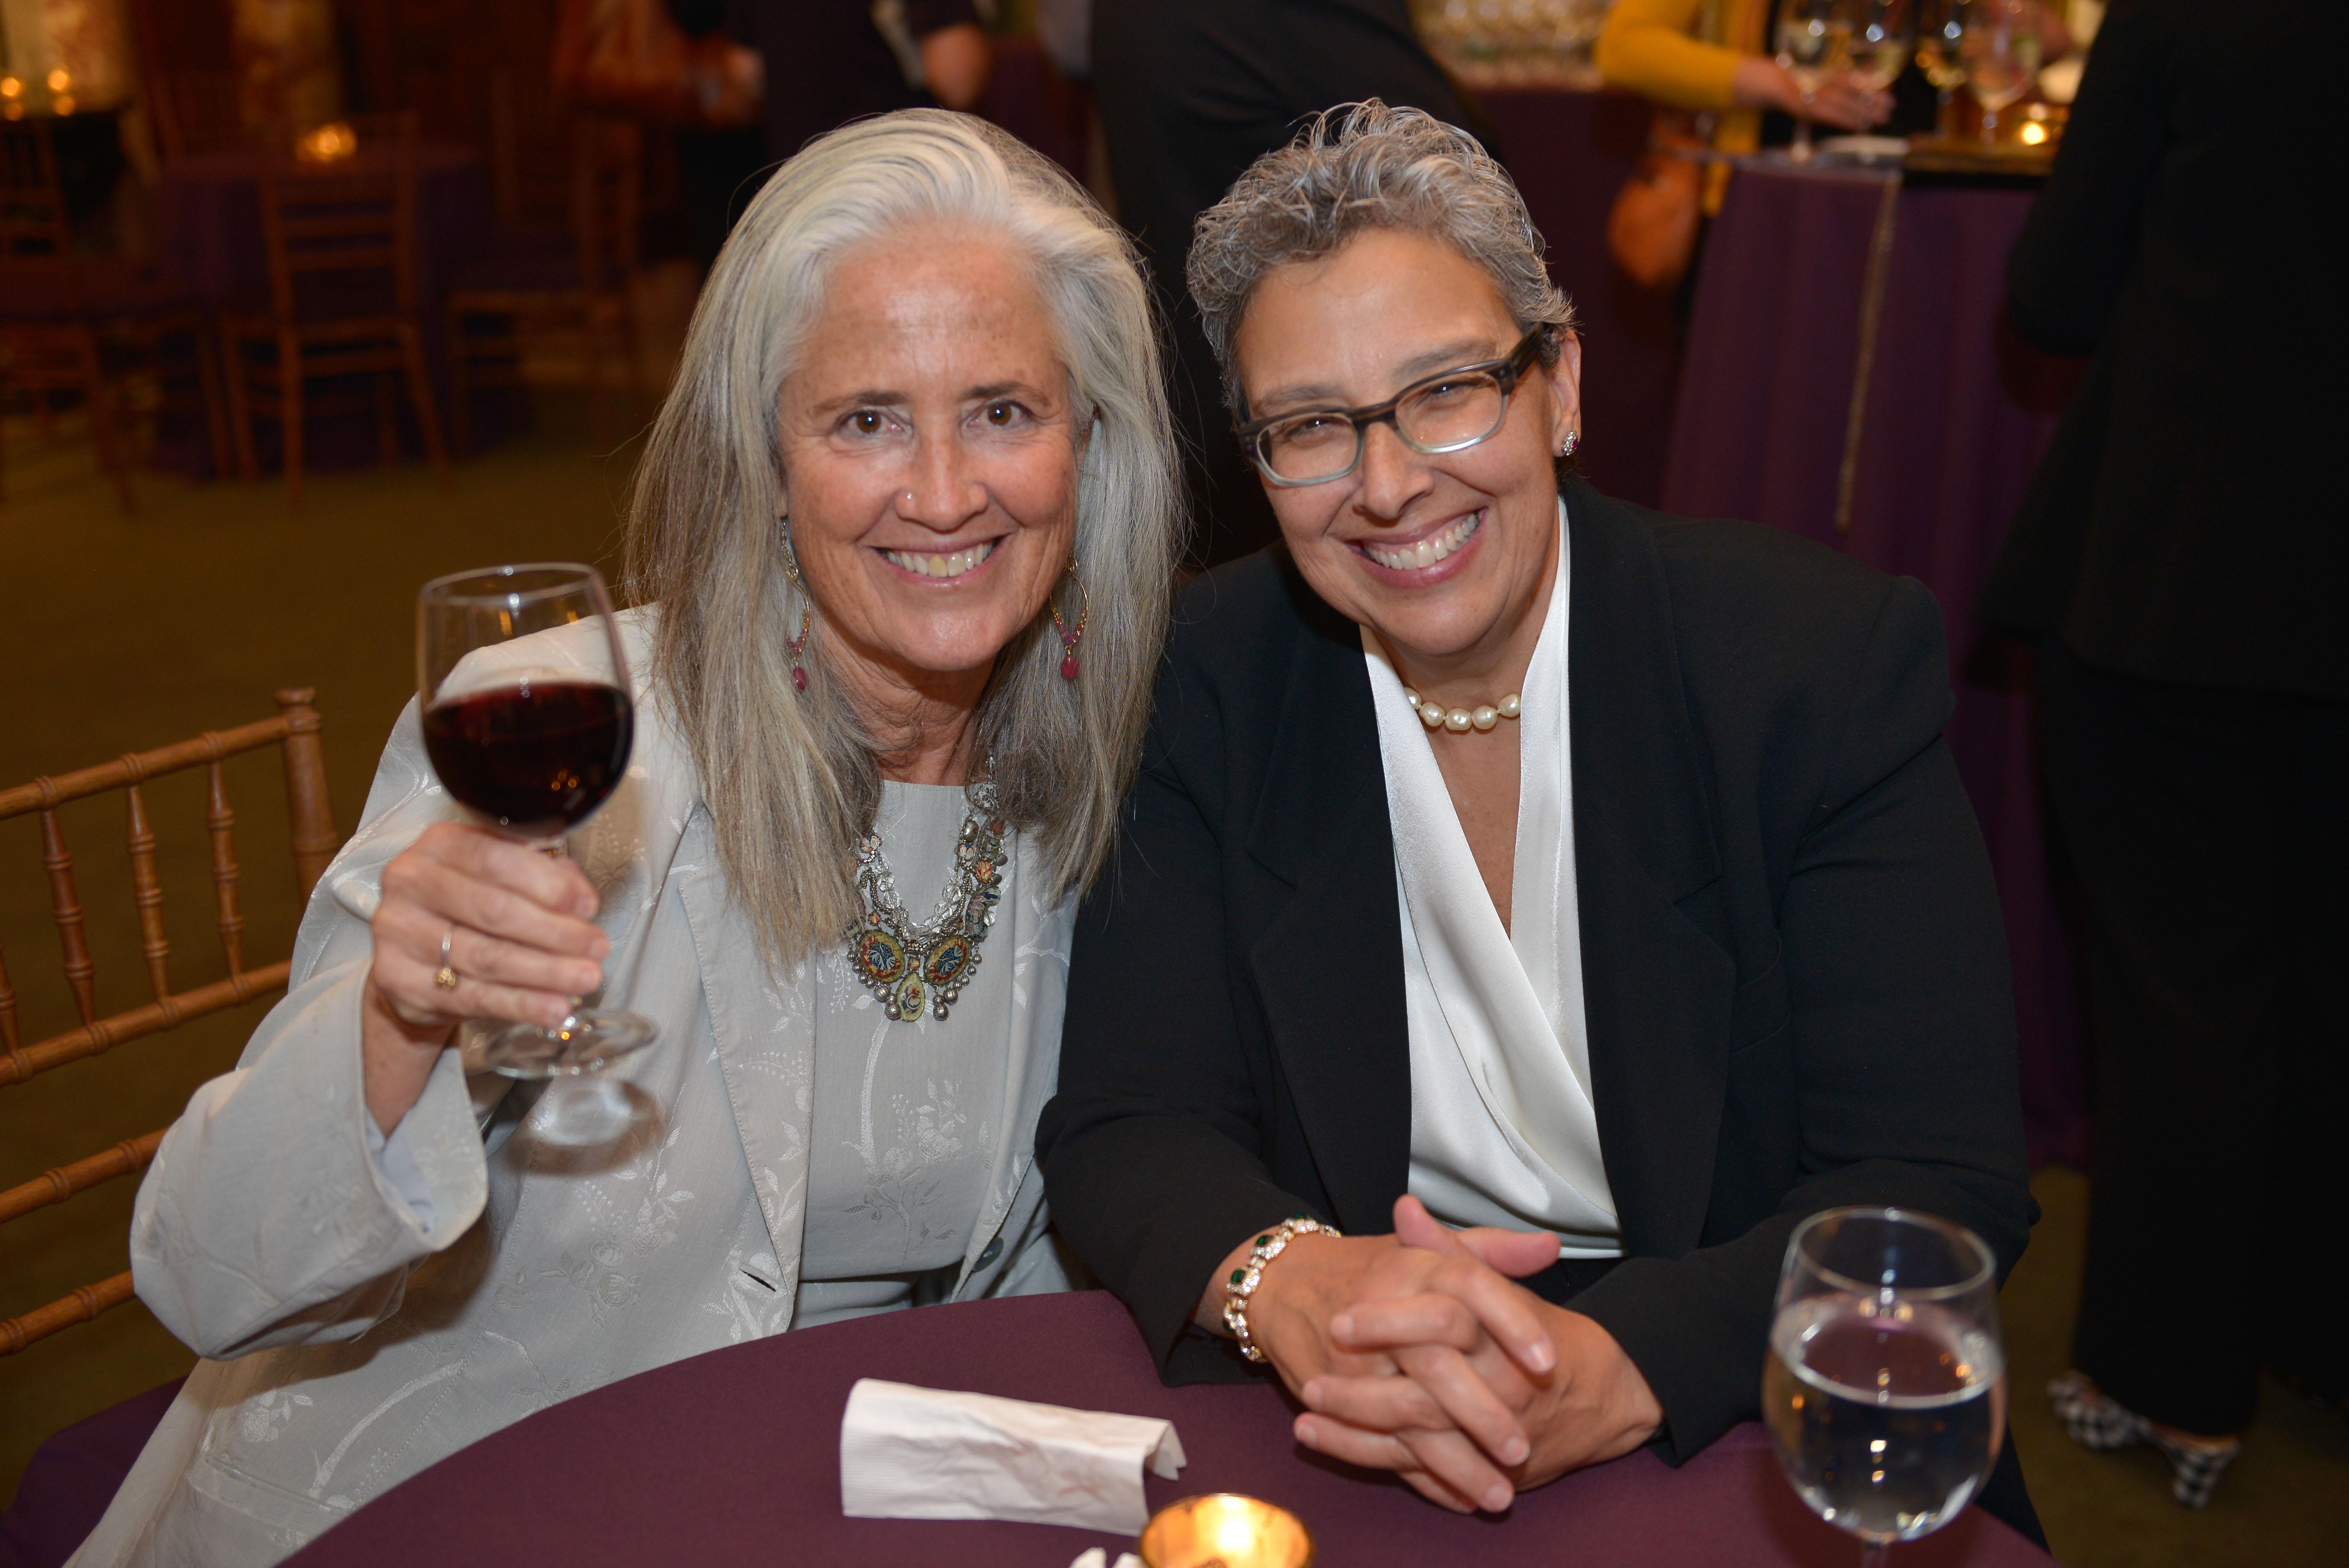 From left: 2018 Covenant Award Recipient Deborah Newbrun and her nominator, 2016 Covenant Award Recipient Rabbi Benay Lappe.